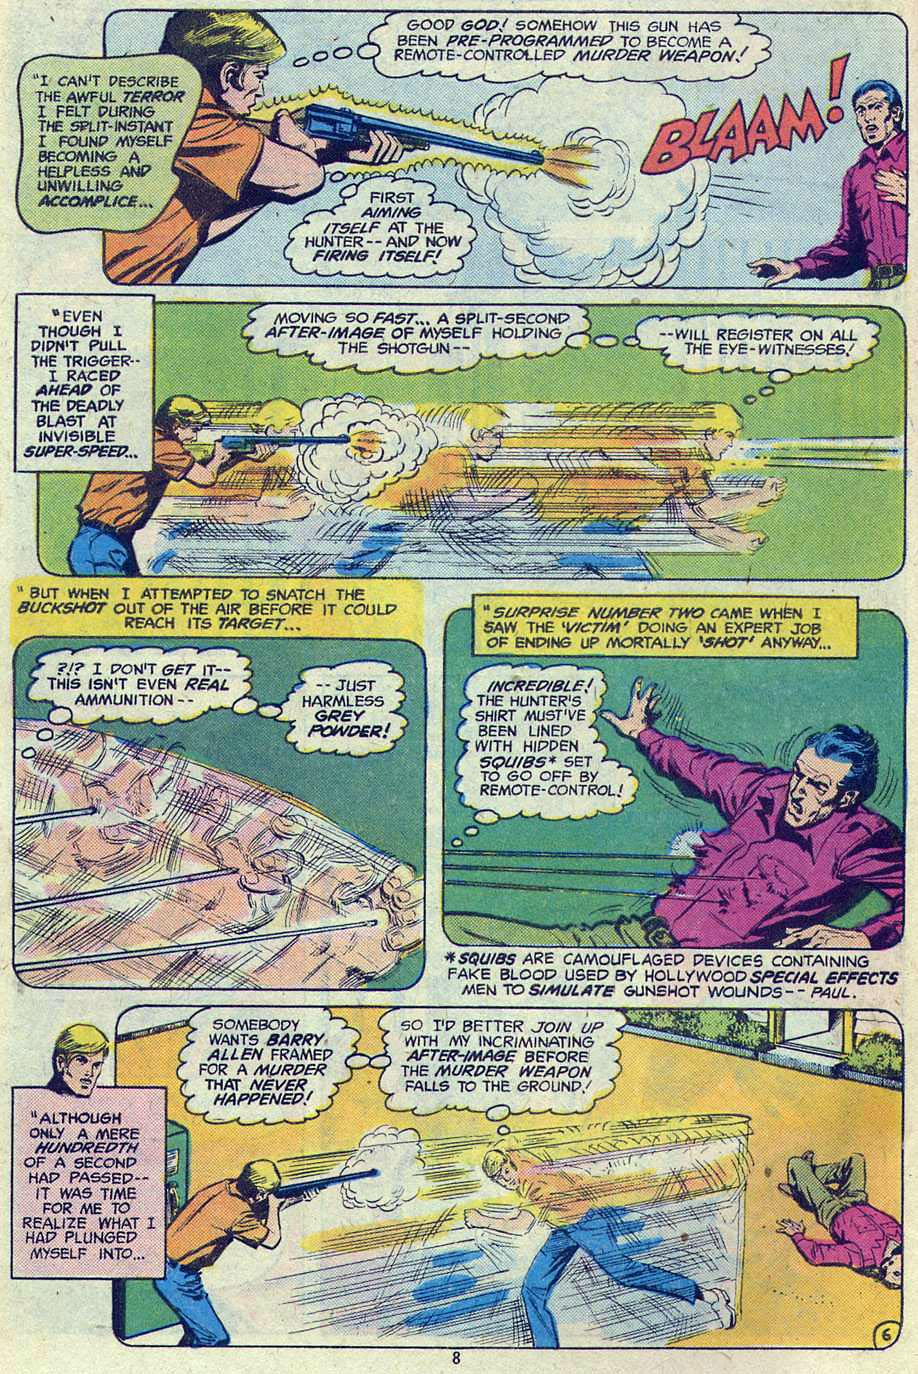 Read online Adventure Comics (1938) comic -  Issue #461 - 8